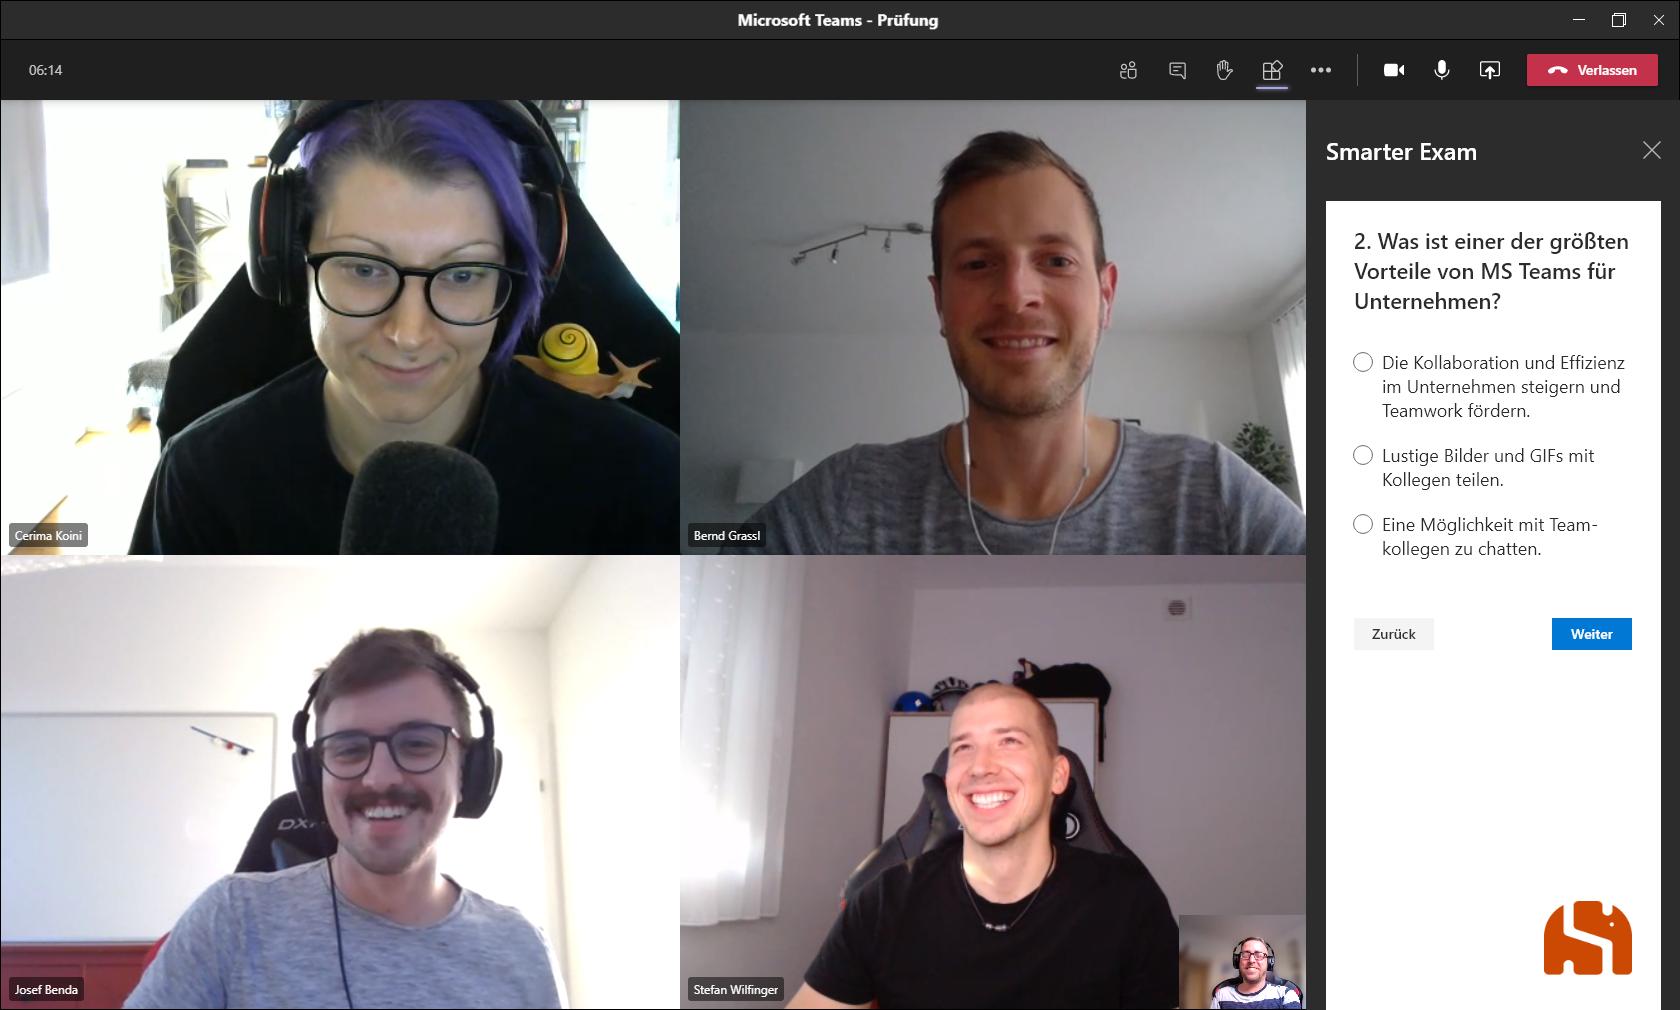 Microsoft Teams Meeting Apps: Smarter Exams